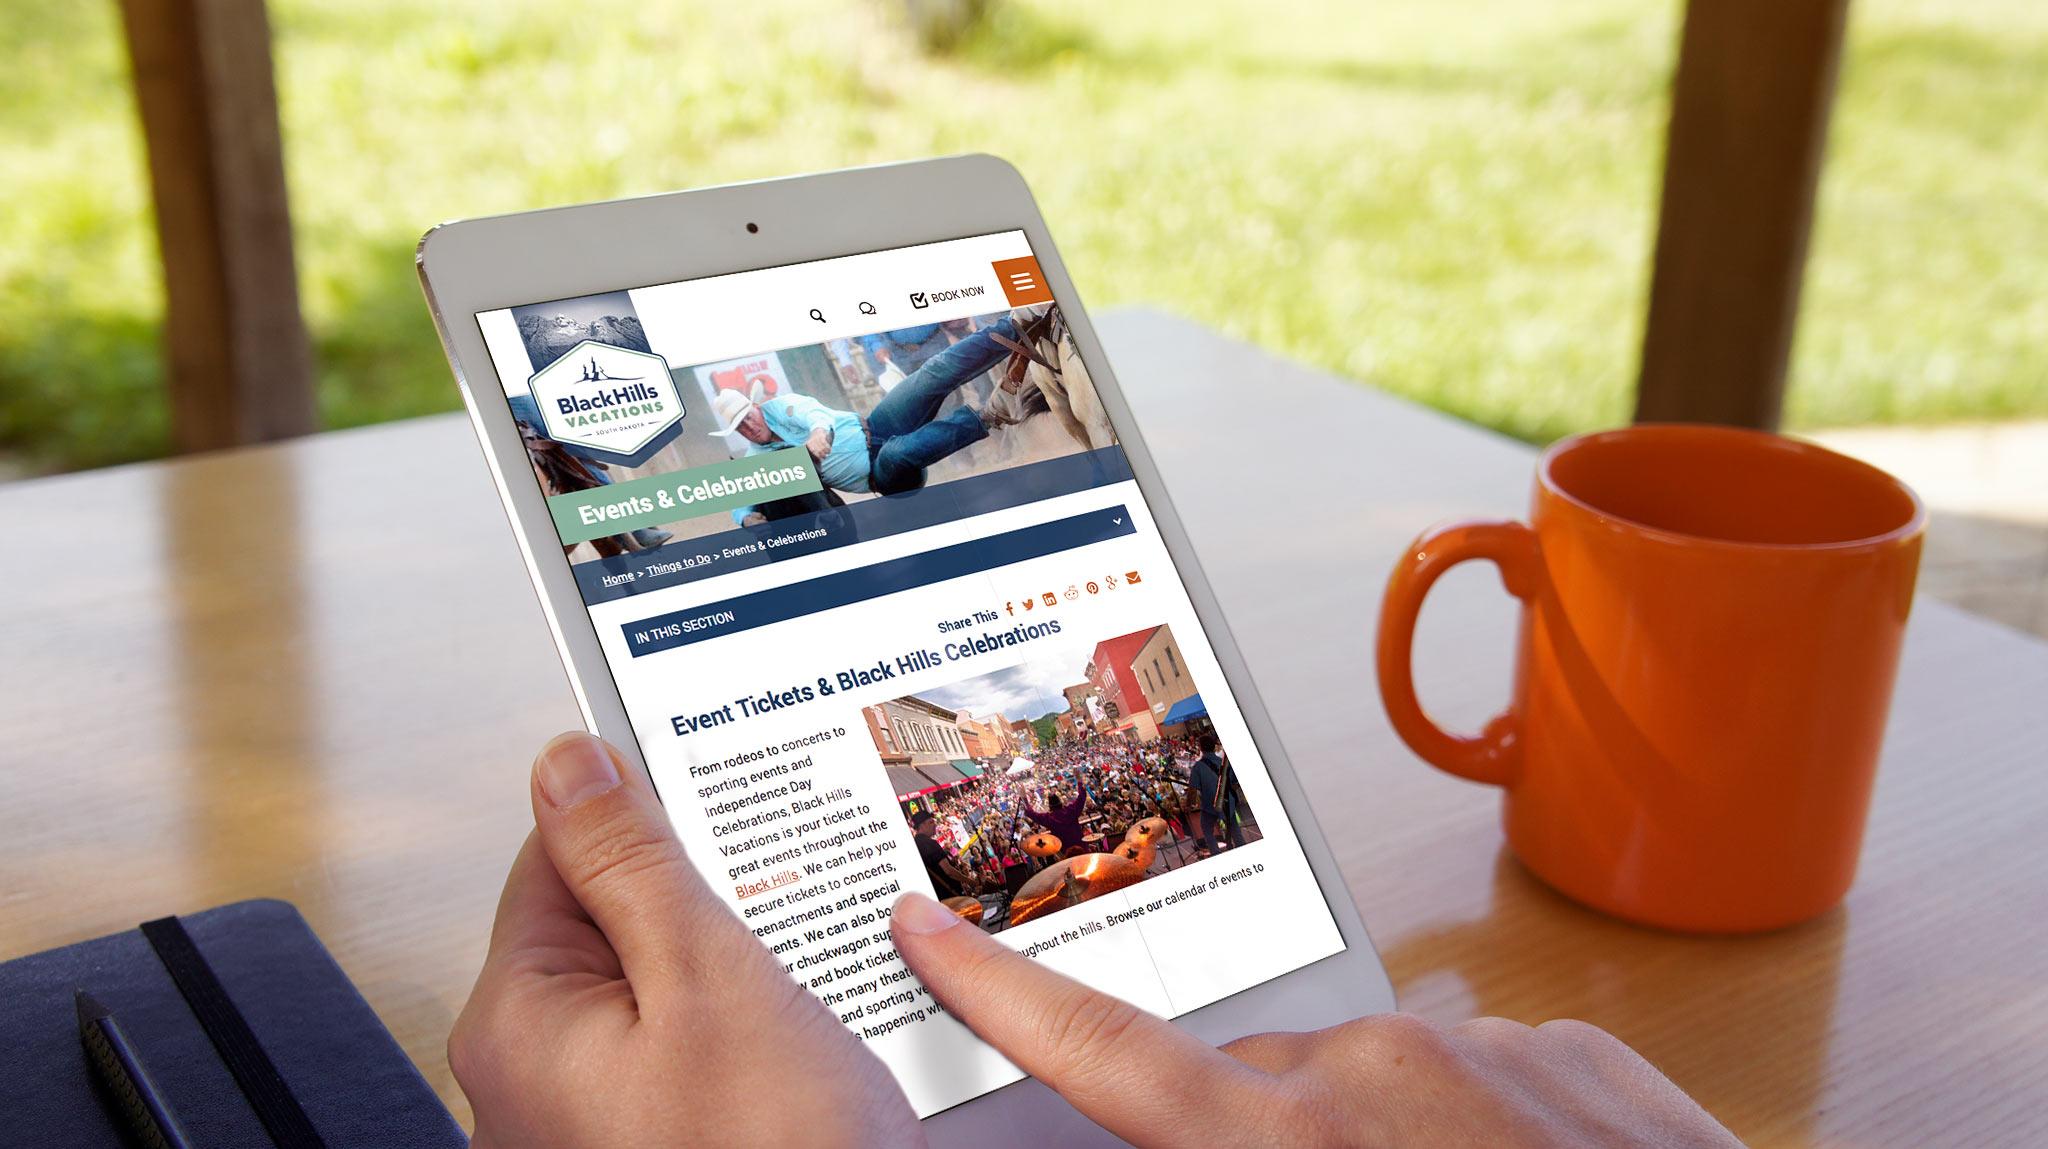 iPad Viewing Website   Black Hills Vacations